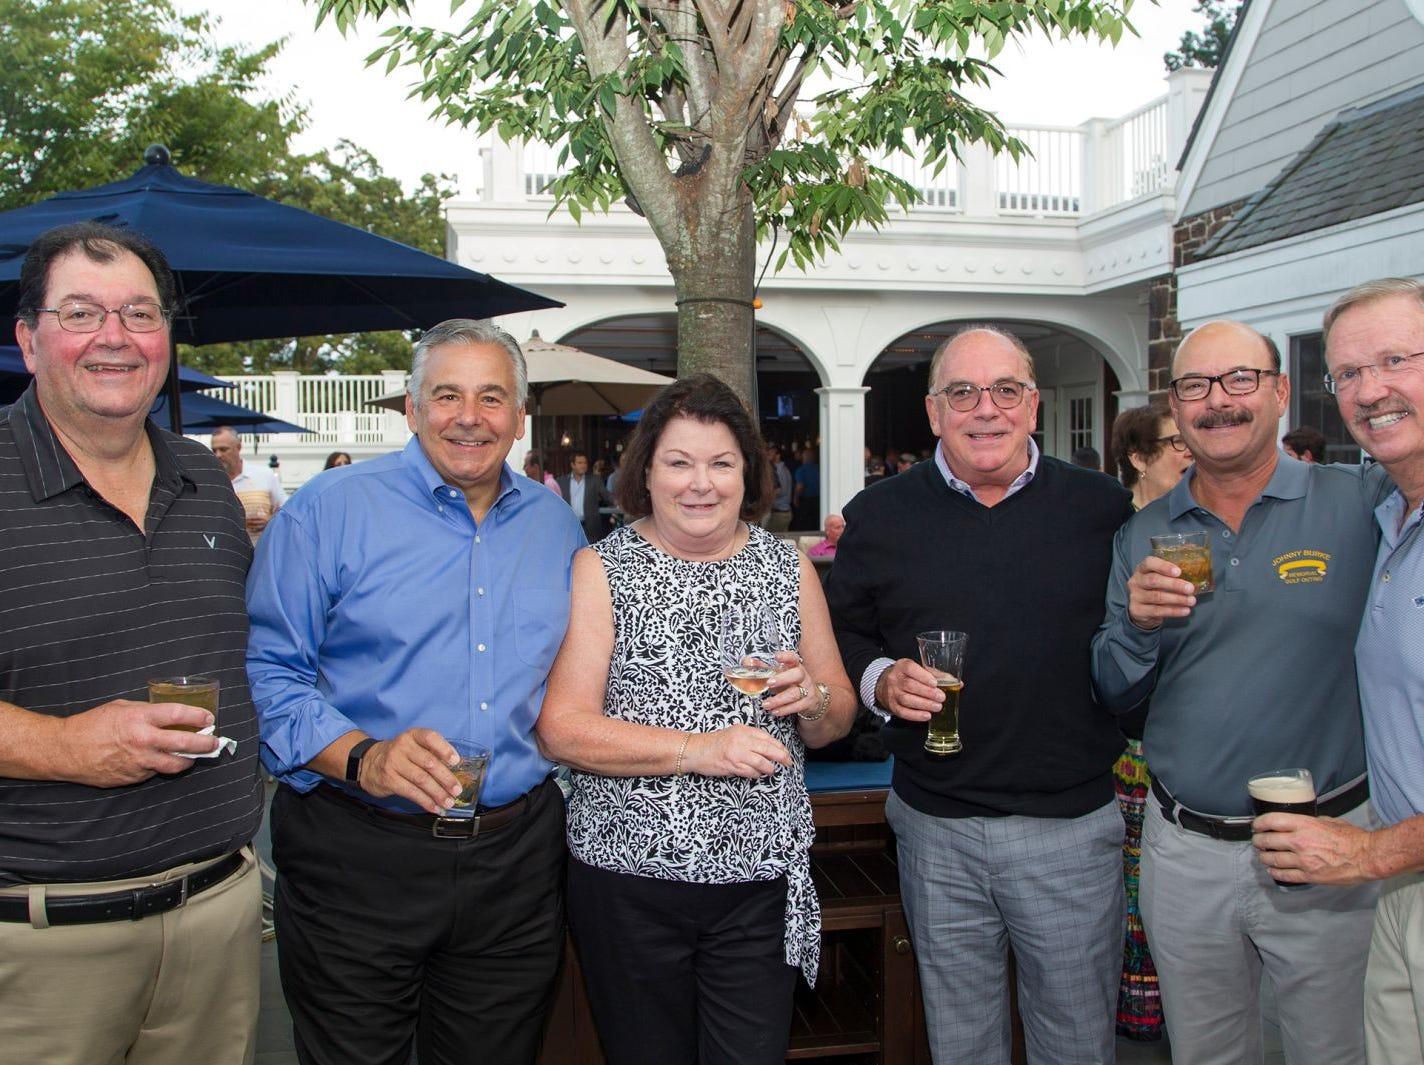 Len Smith, Frank Lento, Peg Bushman, Kevin Mulligan, Mark Kanian, Chros Duffy. Institute for Educational Achievement held its 23rd annual Golf Classic at Hackensack Golf Club in Oradell. 10/01/2018